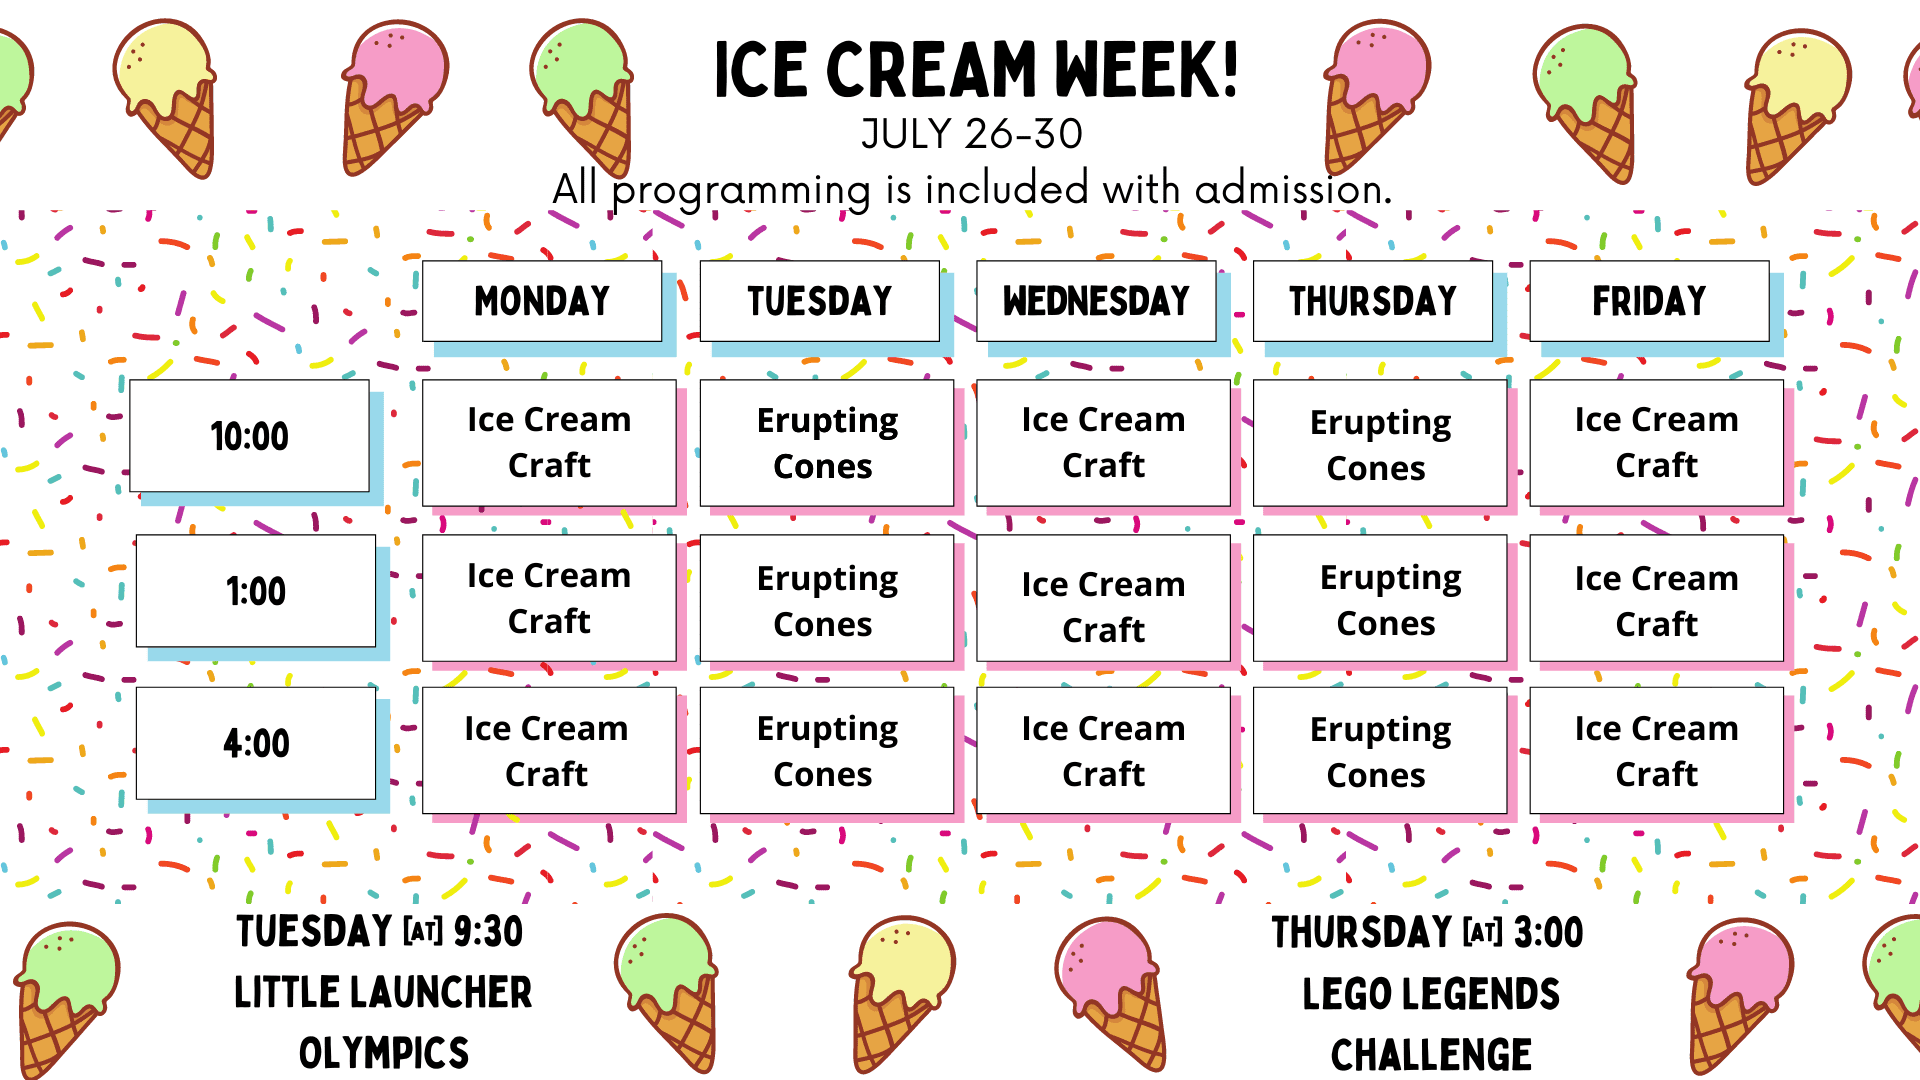 ICE CREAM WEEK!